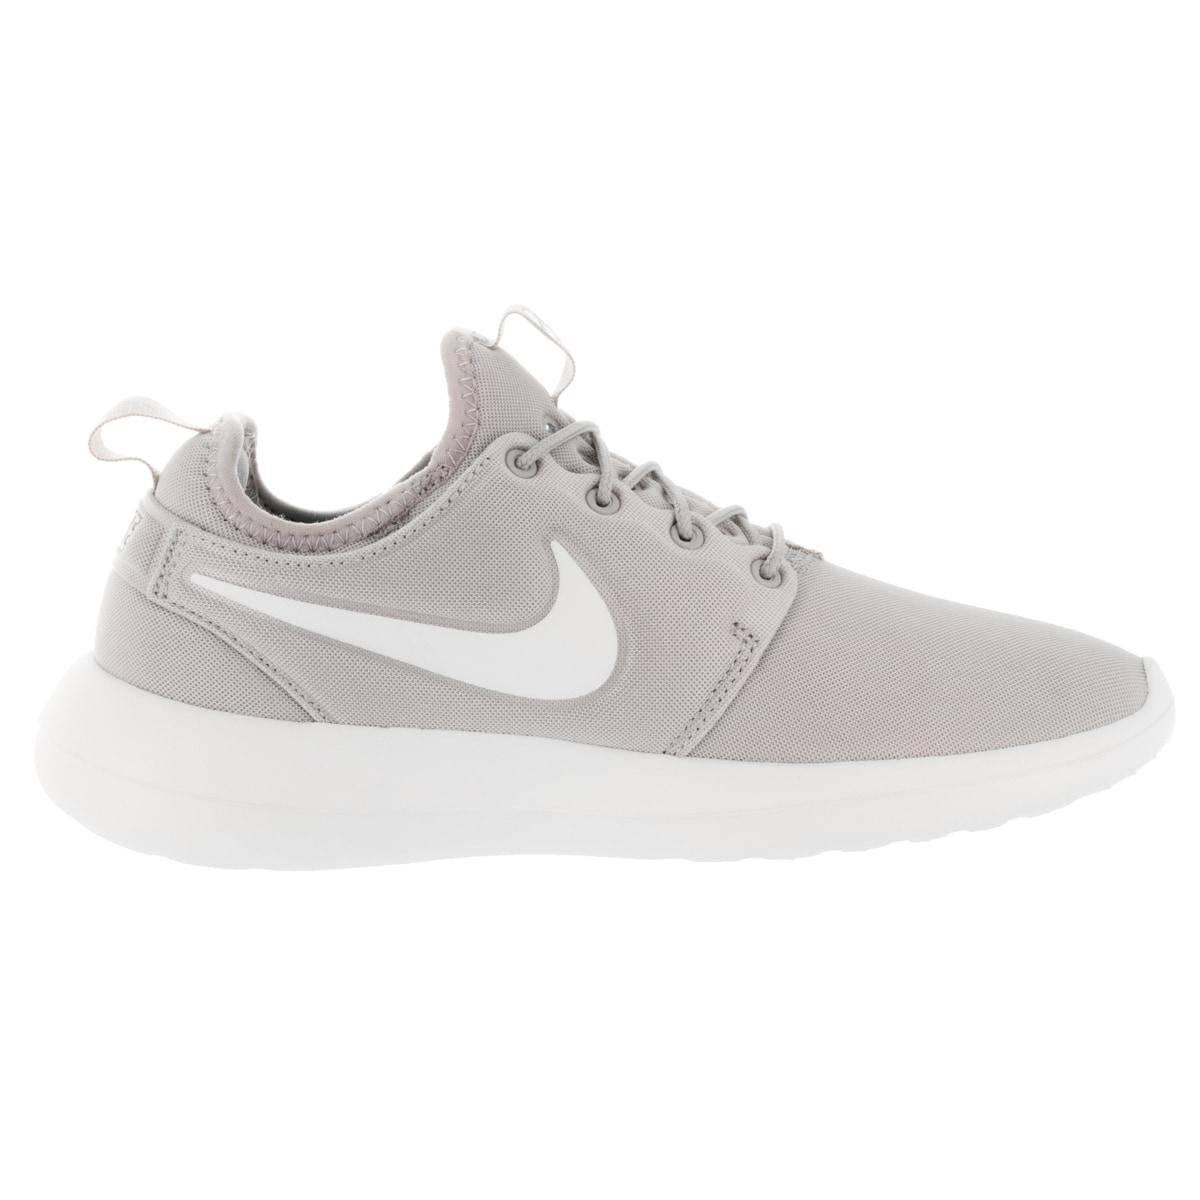 171abd511a0e1 Shop Nike Women s  Roshe Two  Light Iron Ore